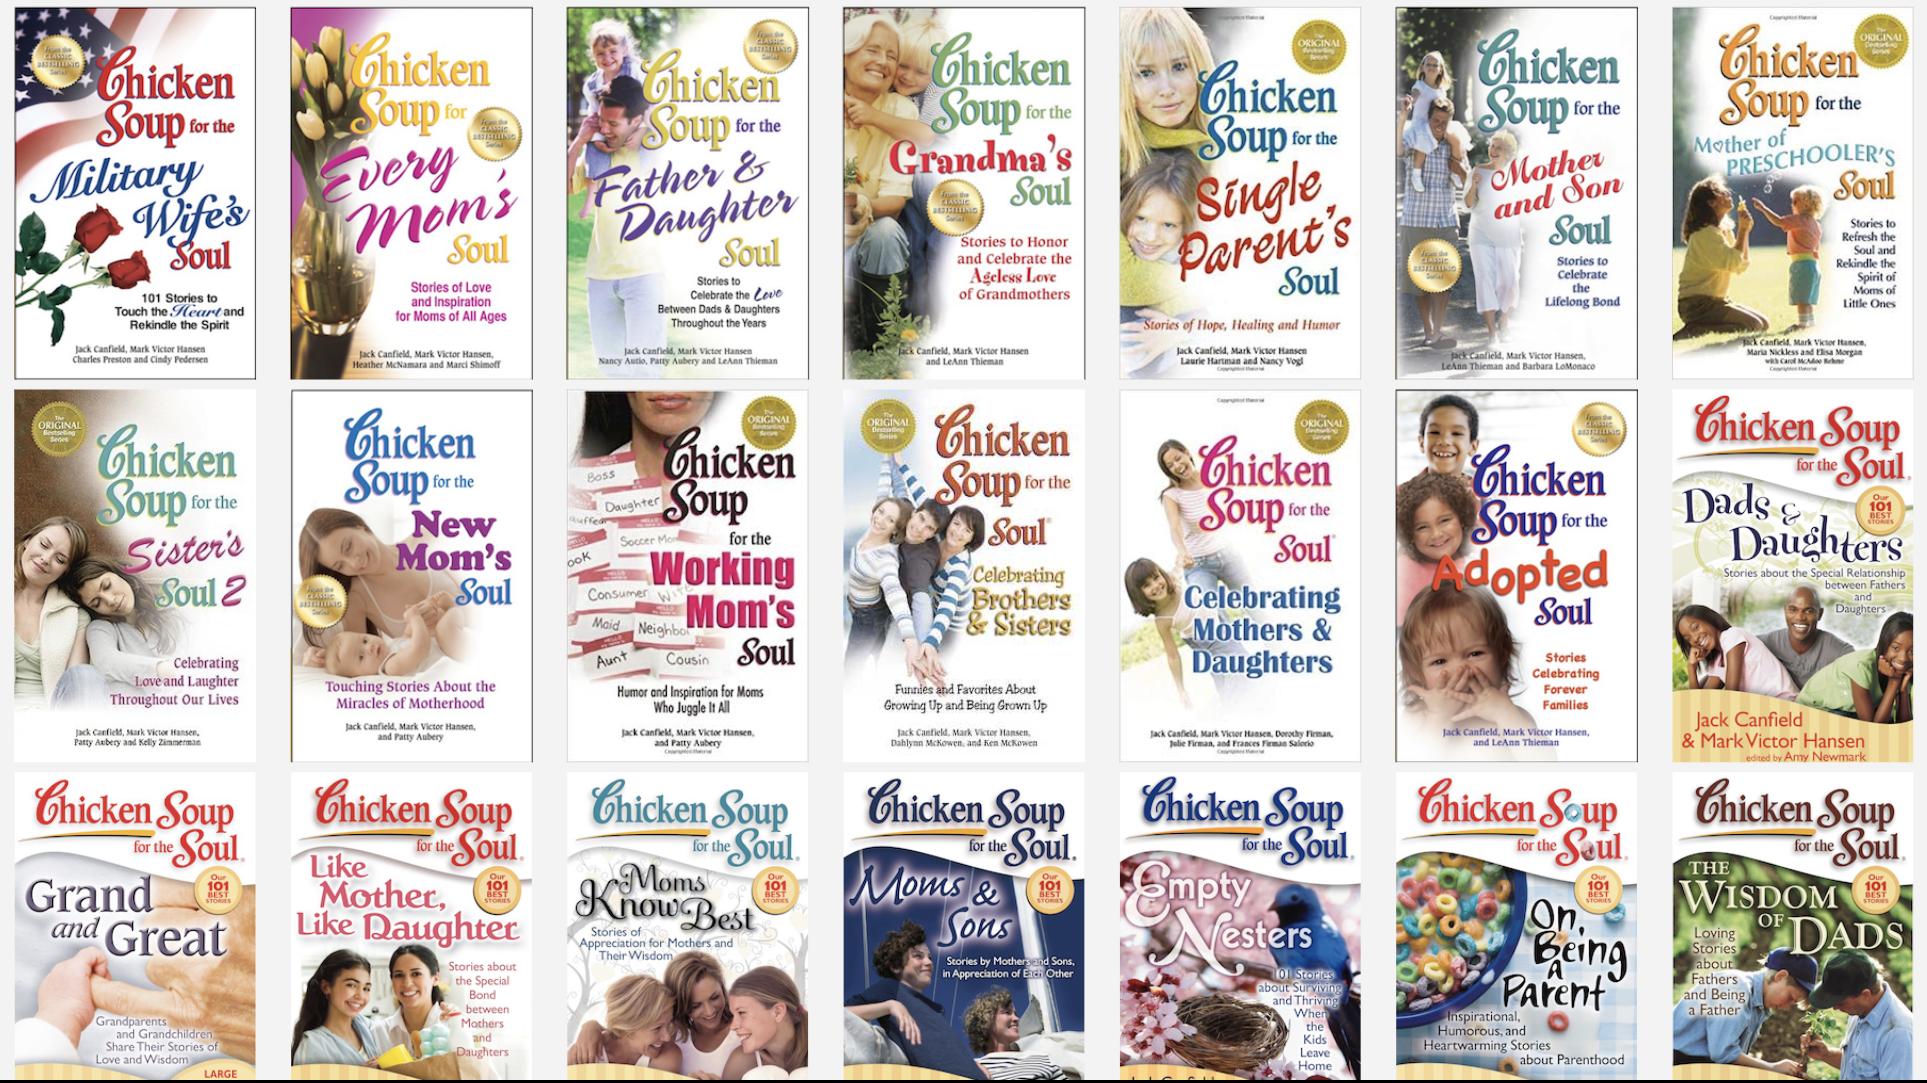 Chicken Soup for the Quartz Reader Soul